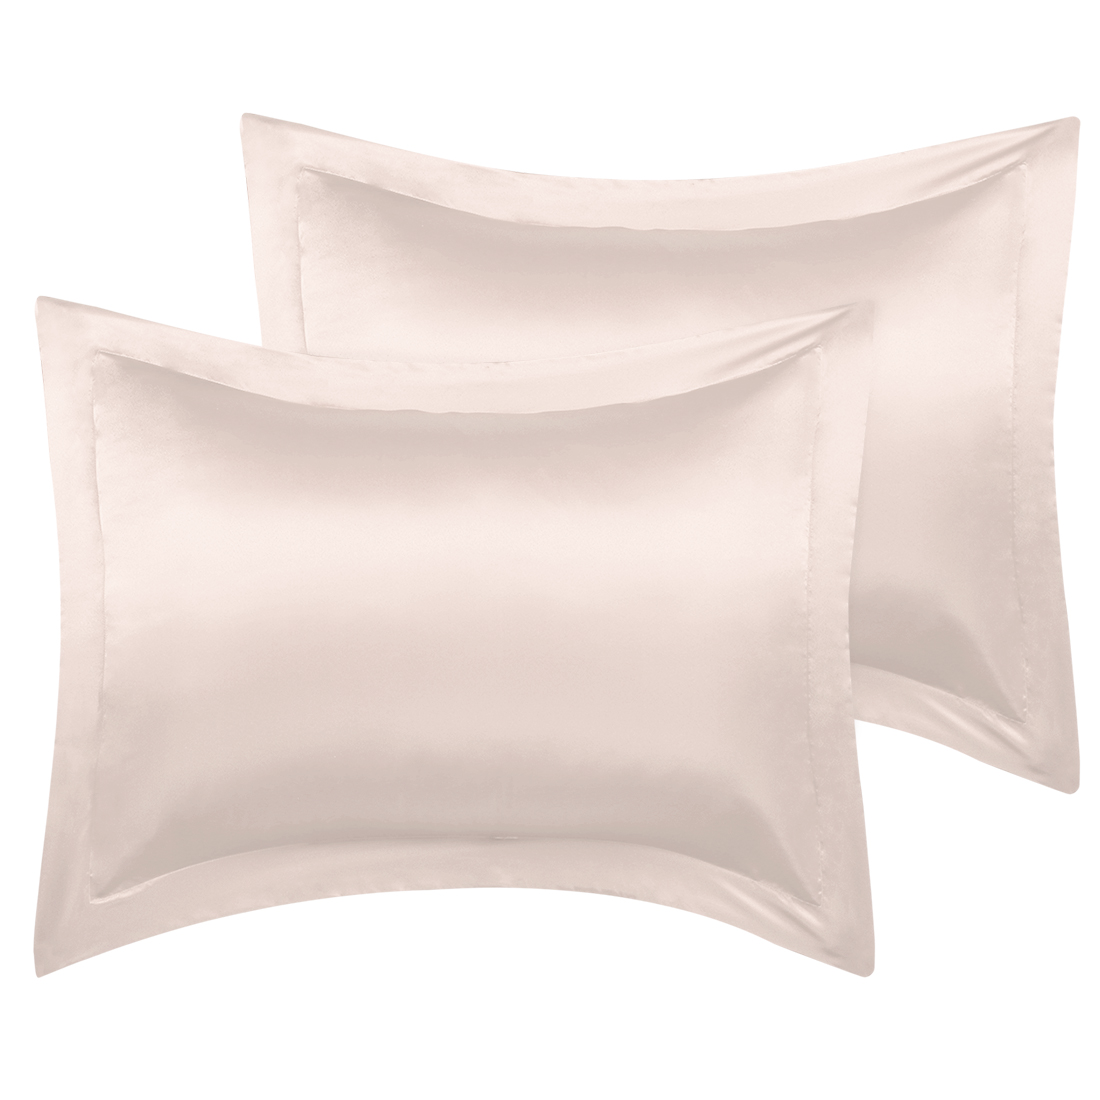 2 Pcs Light Tan Pillow Shams Satin Pillow Cases Queen Oxford Pillowcases